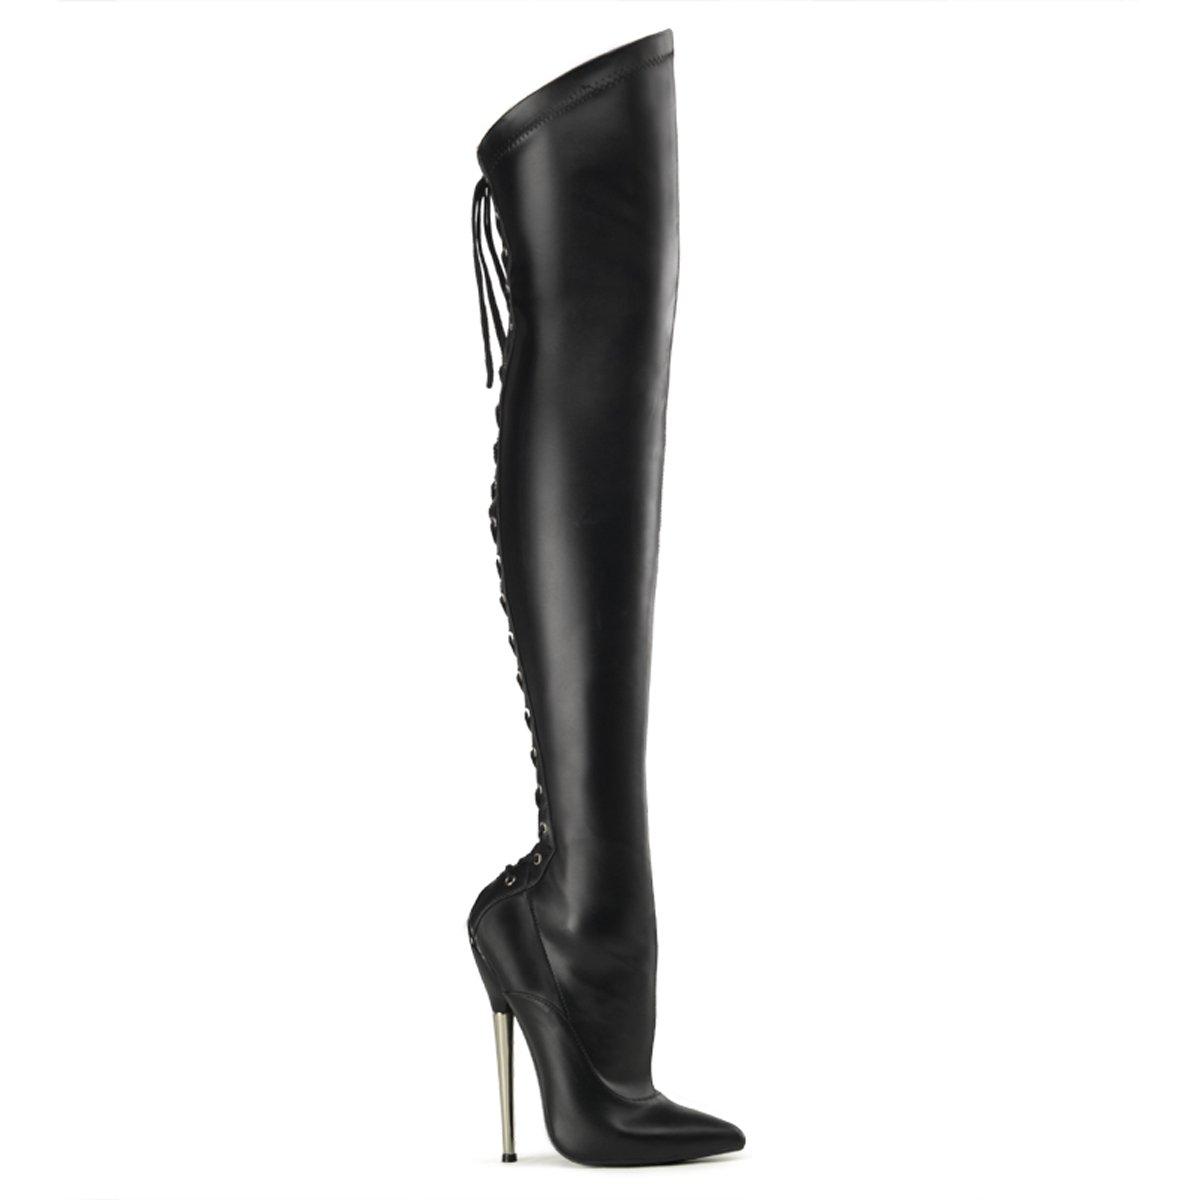 Devious DAGGER-3060 6 1/4 Solid Brass Heel Back Lace-Up Thigh BT B00IA640O8 8 B(M) US|Black Stretch Pu